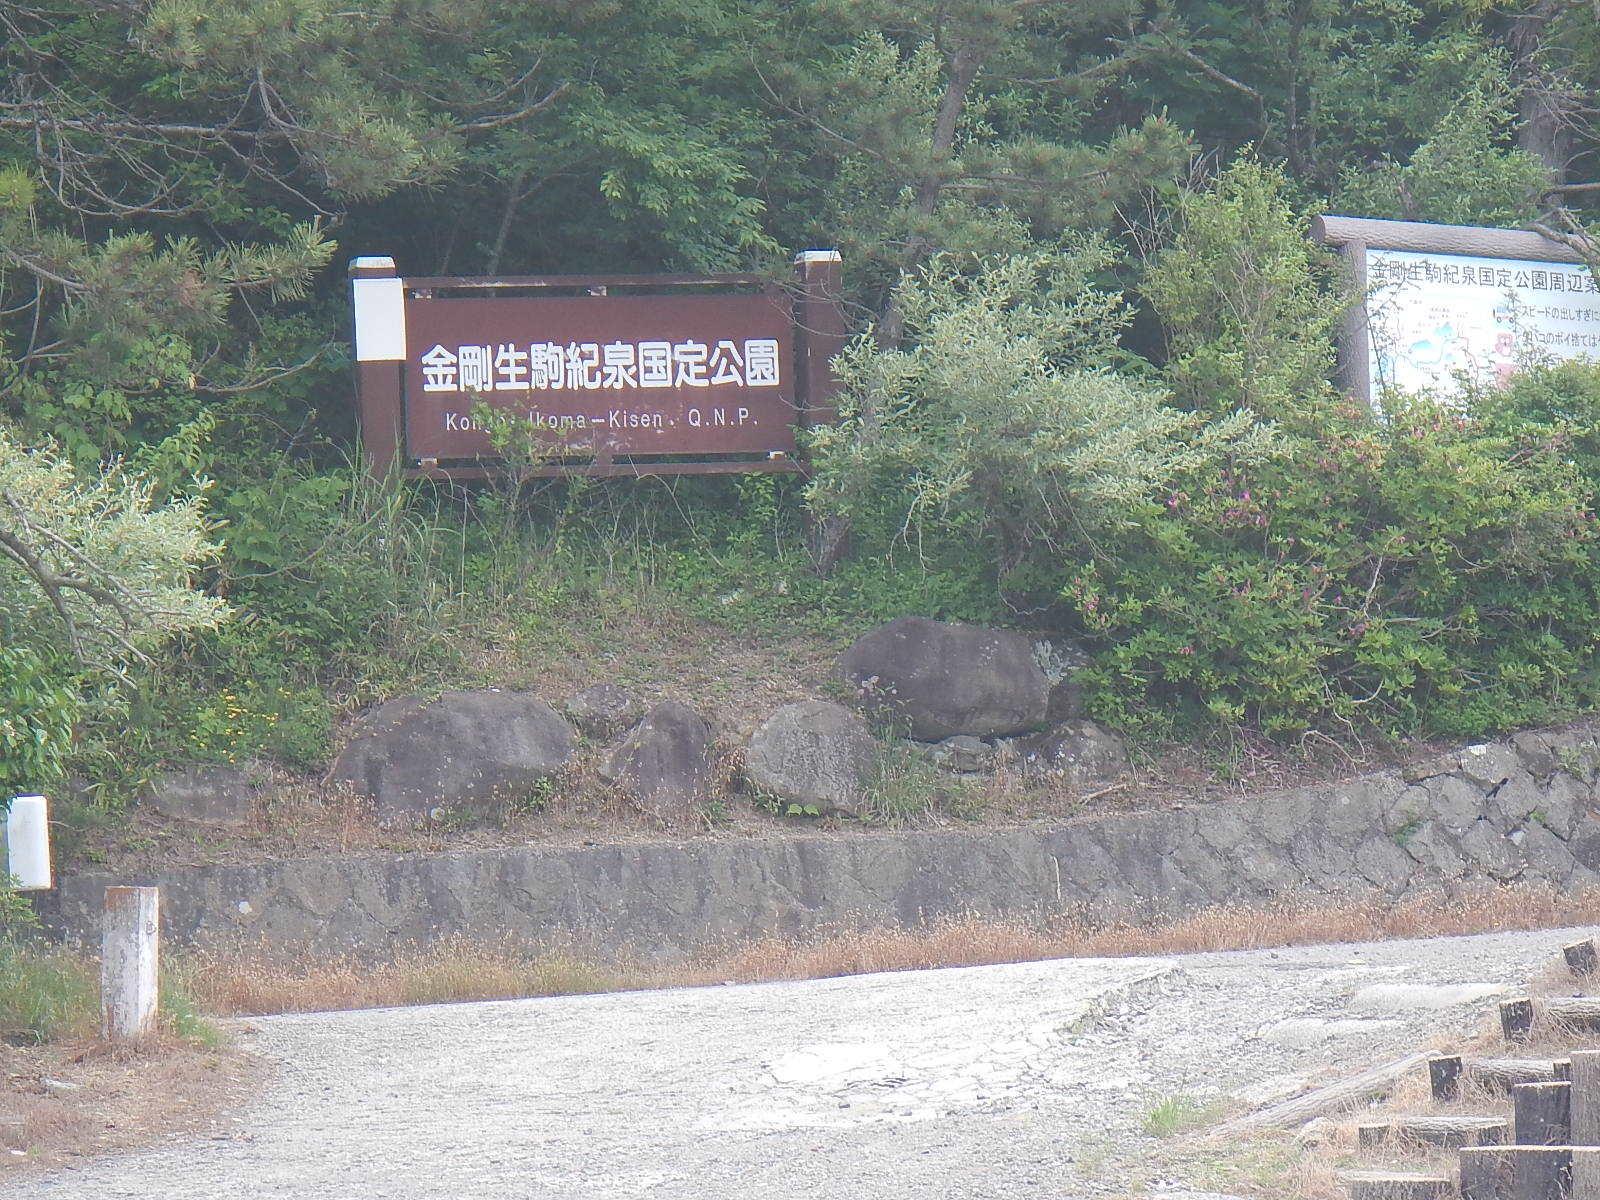 和泉葛城山へ_a0386742_20550424.jpg